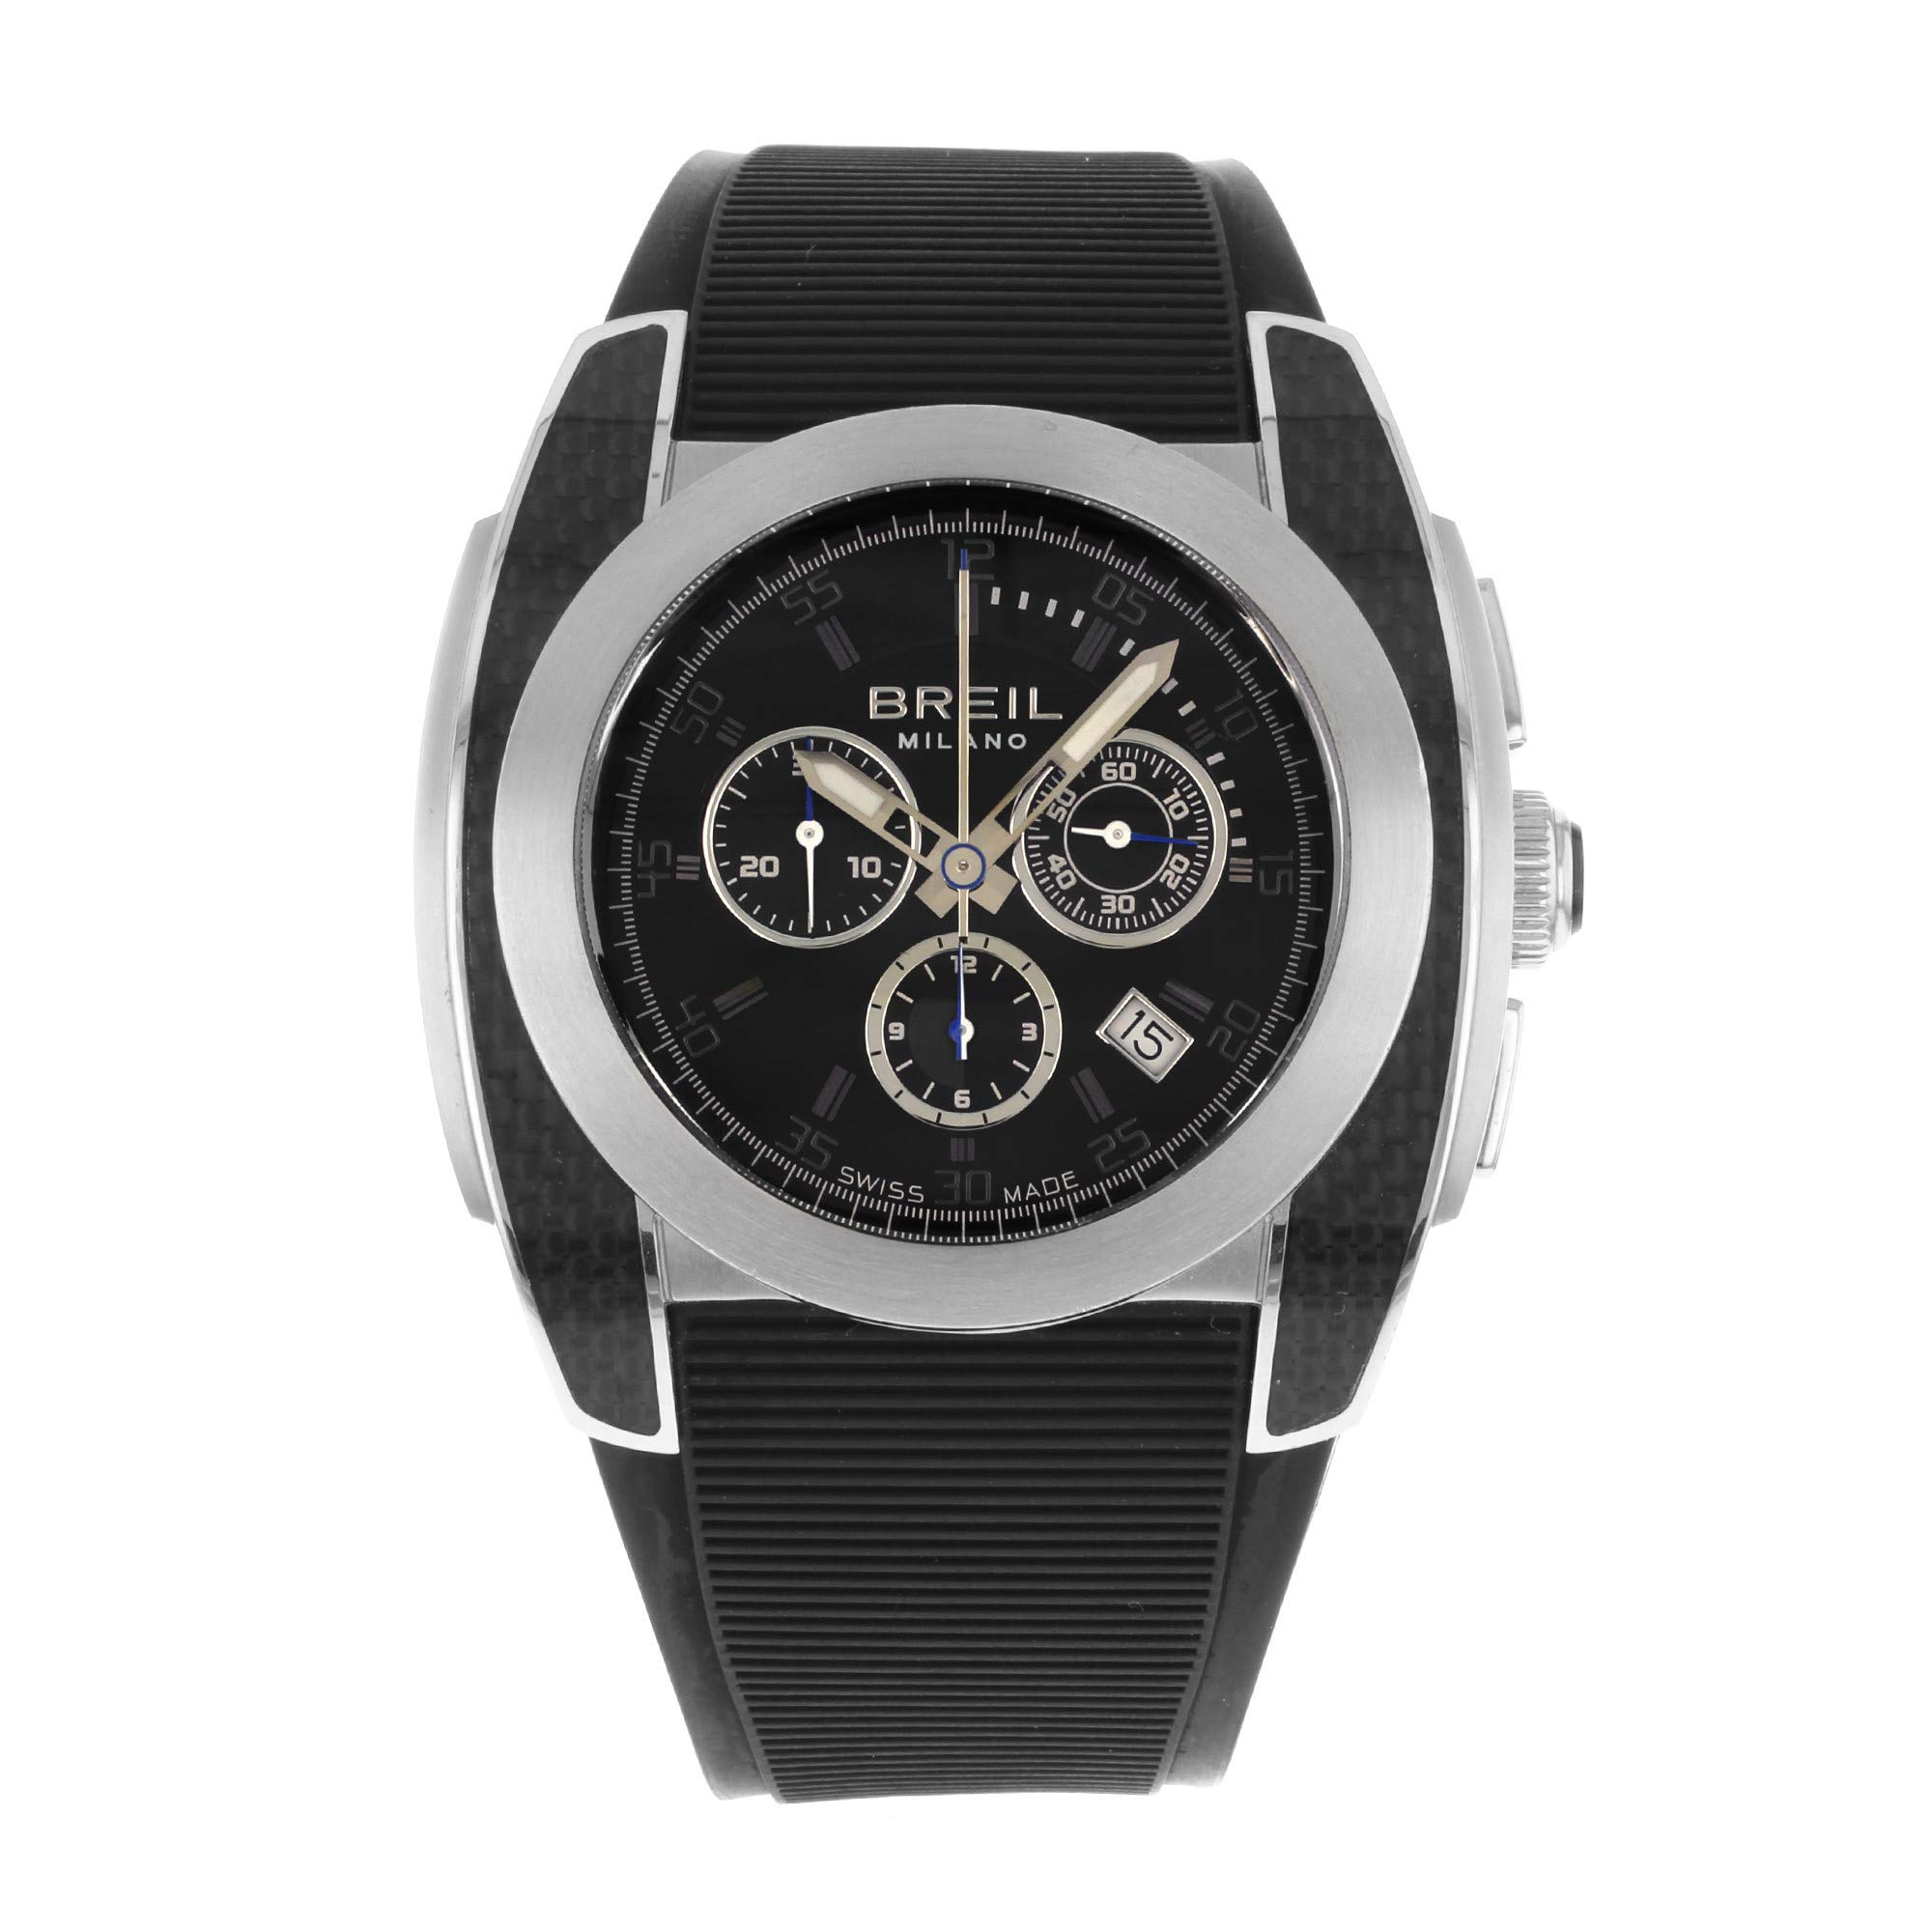 Breil Mediterraneo Quartz Male Watch BW0381 (Certified Pre-Owned)